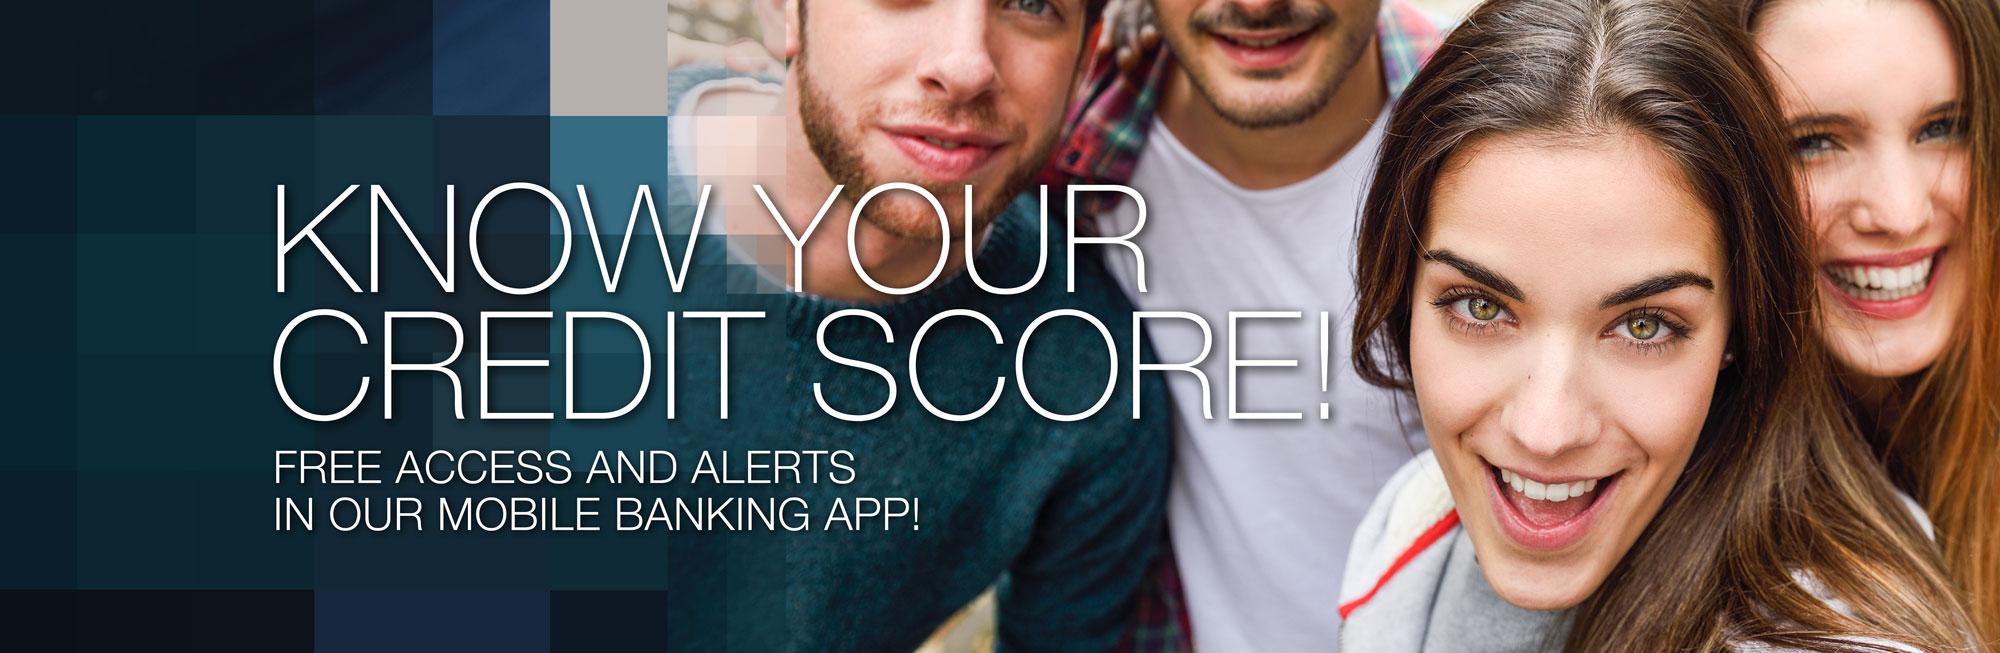 Free Credit Score & Alerts!